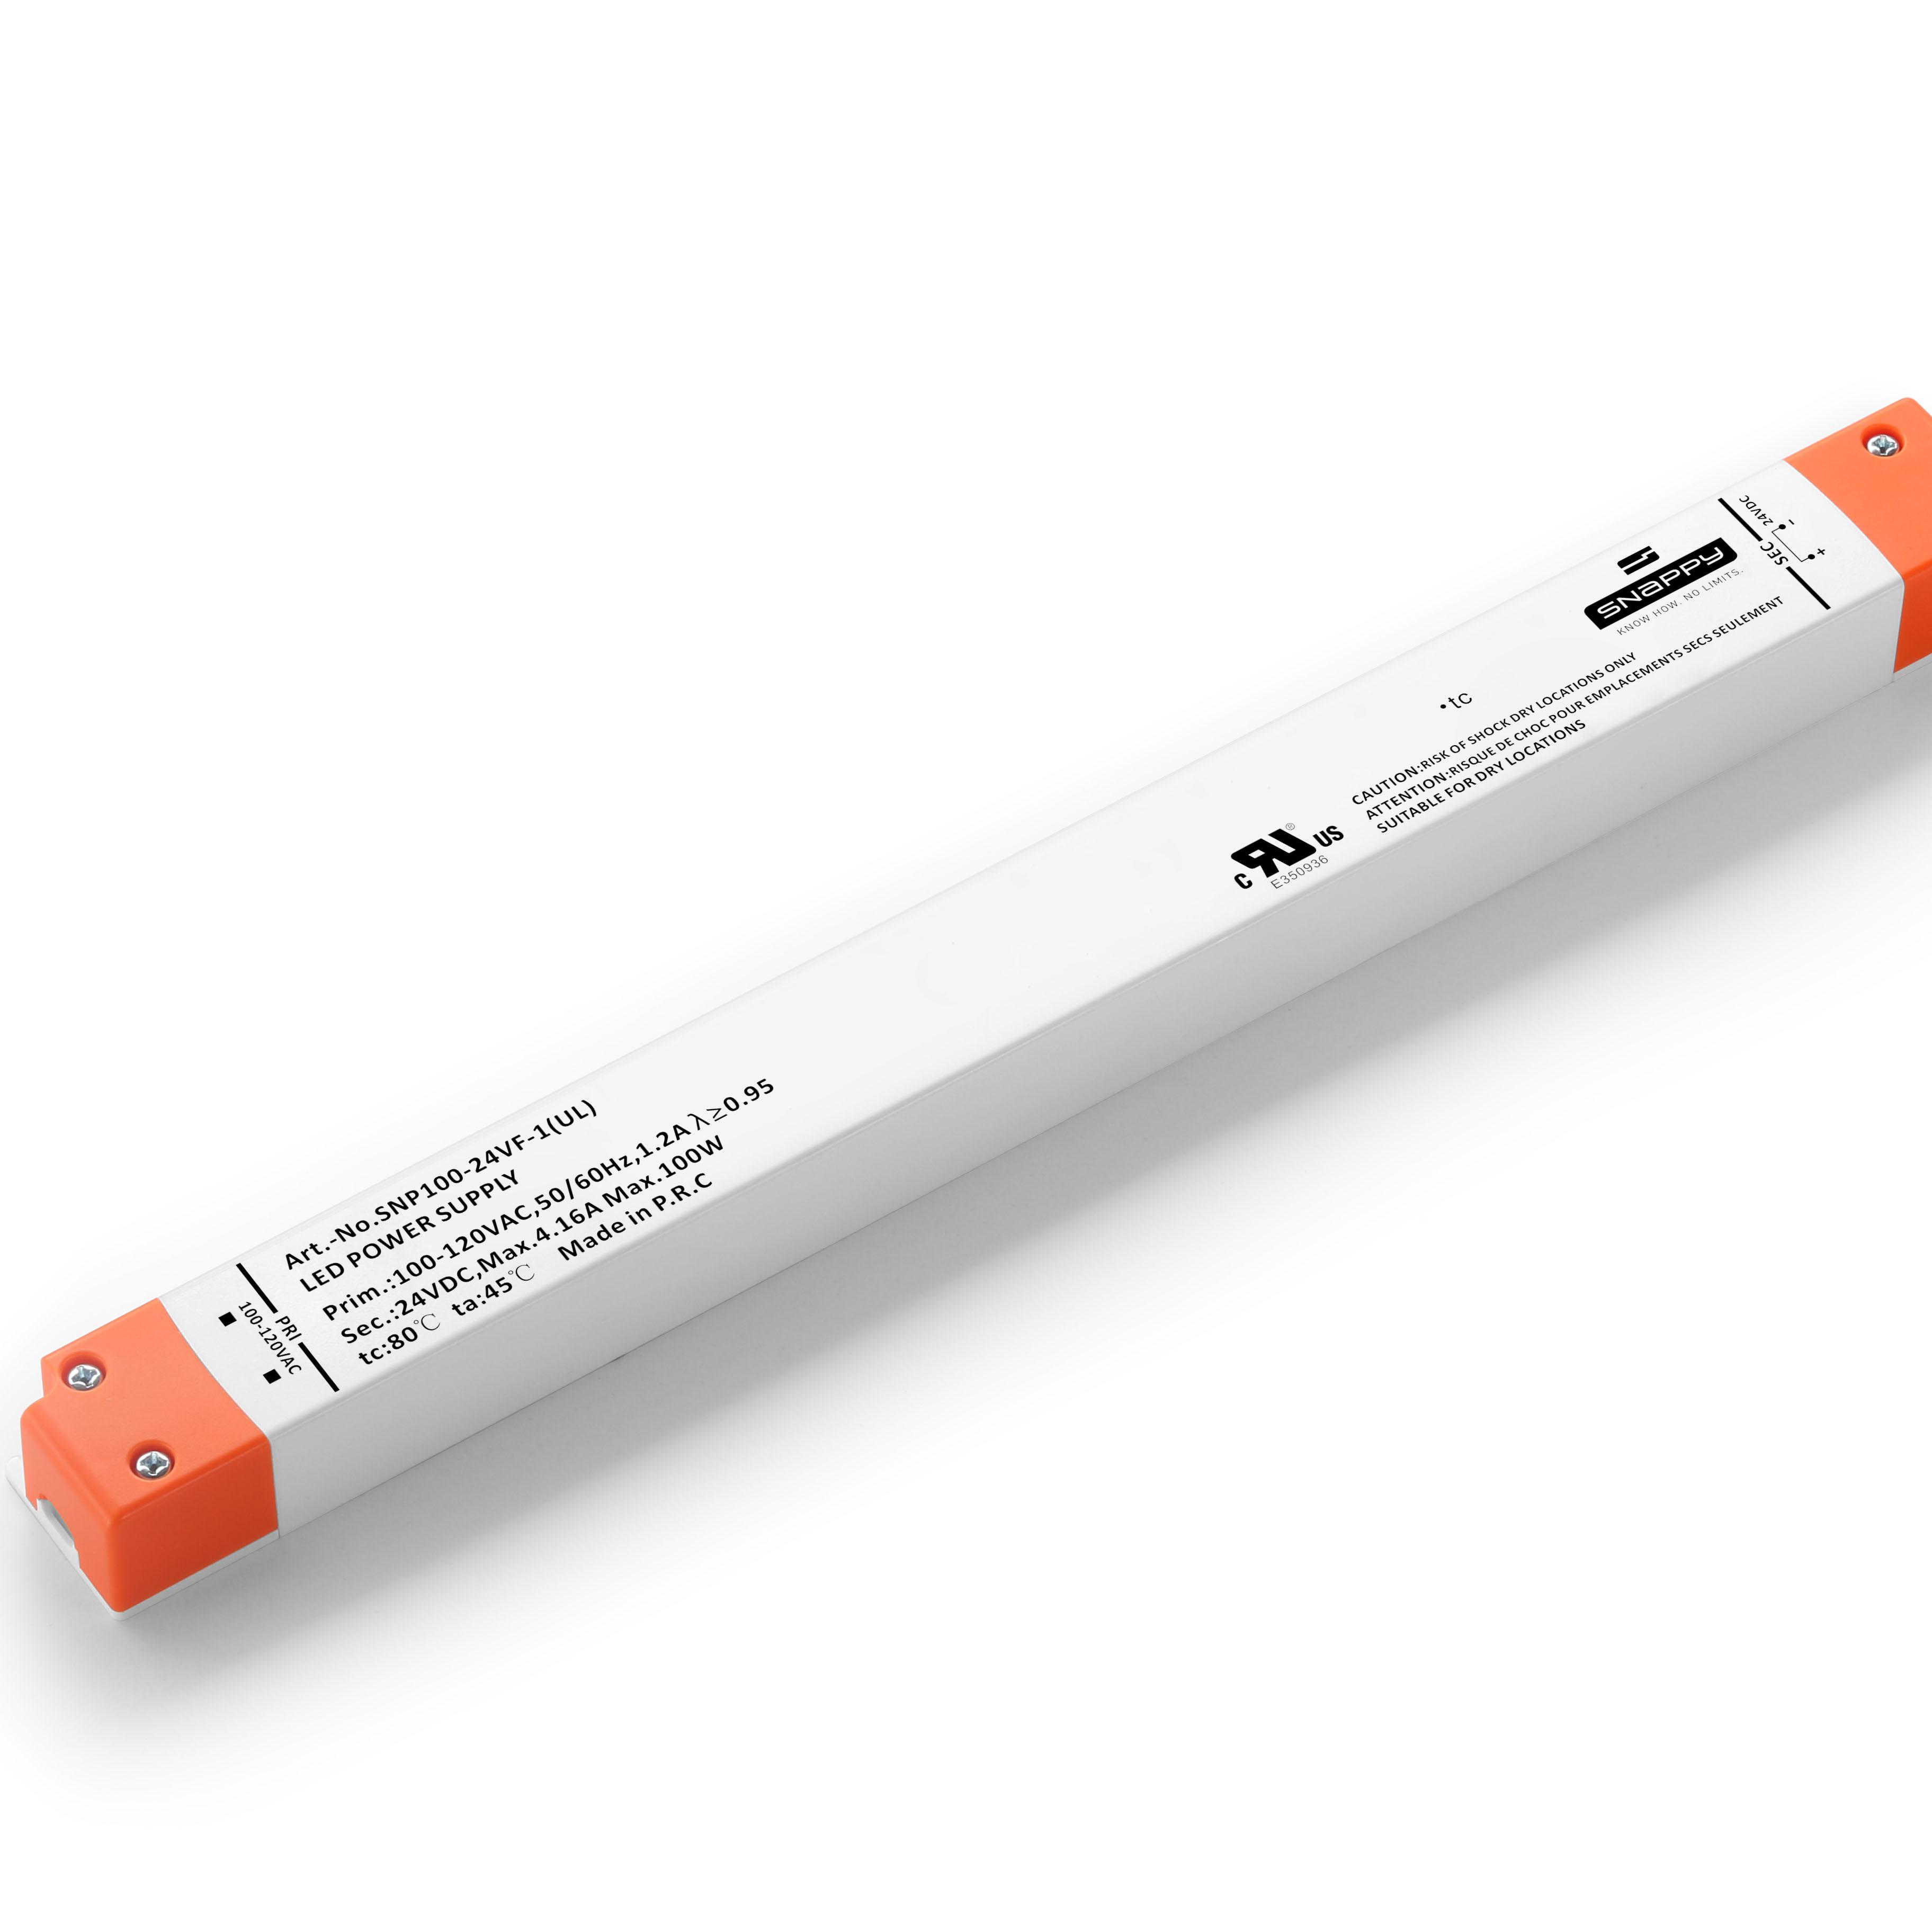 SNP100-24VF-1(USA) 100 W  CUL listed linear led driver